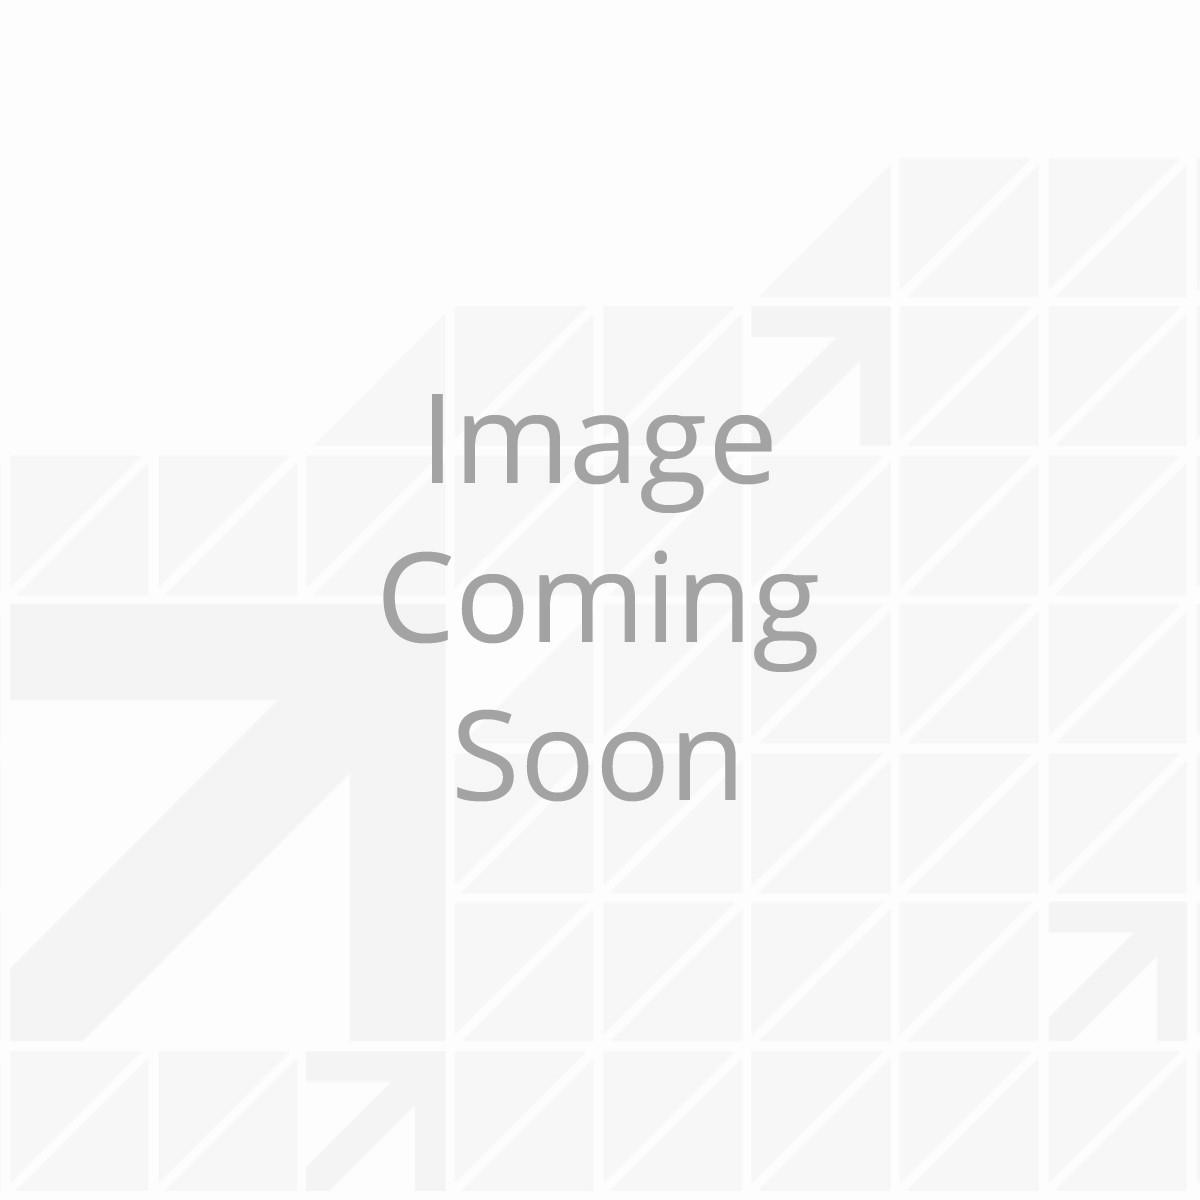 Doorknob and Deadbolt Set for Residential Entry Doors - Keyed Alike